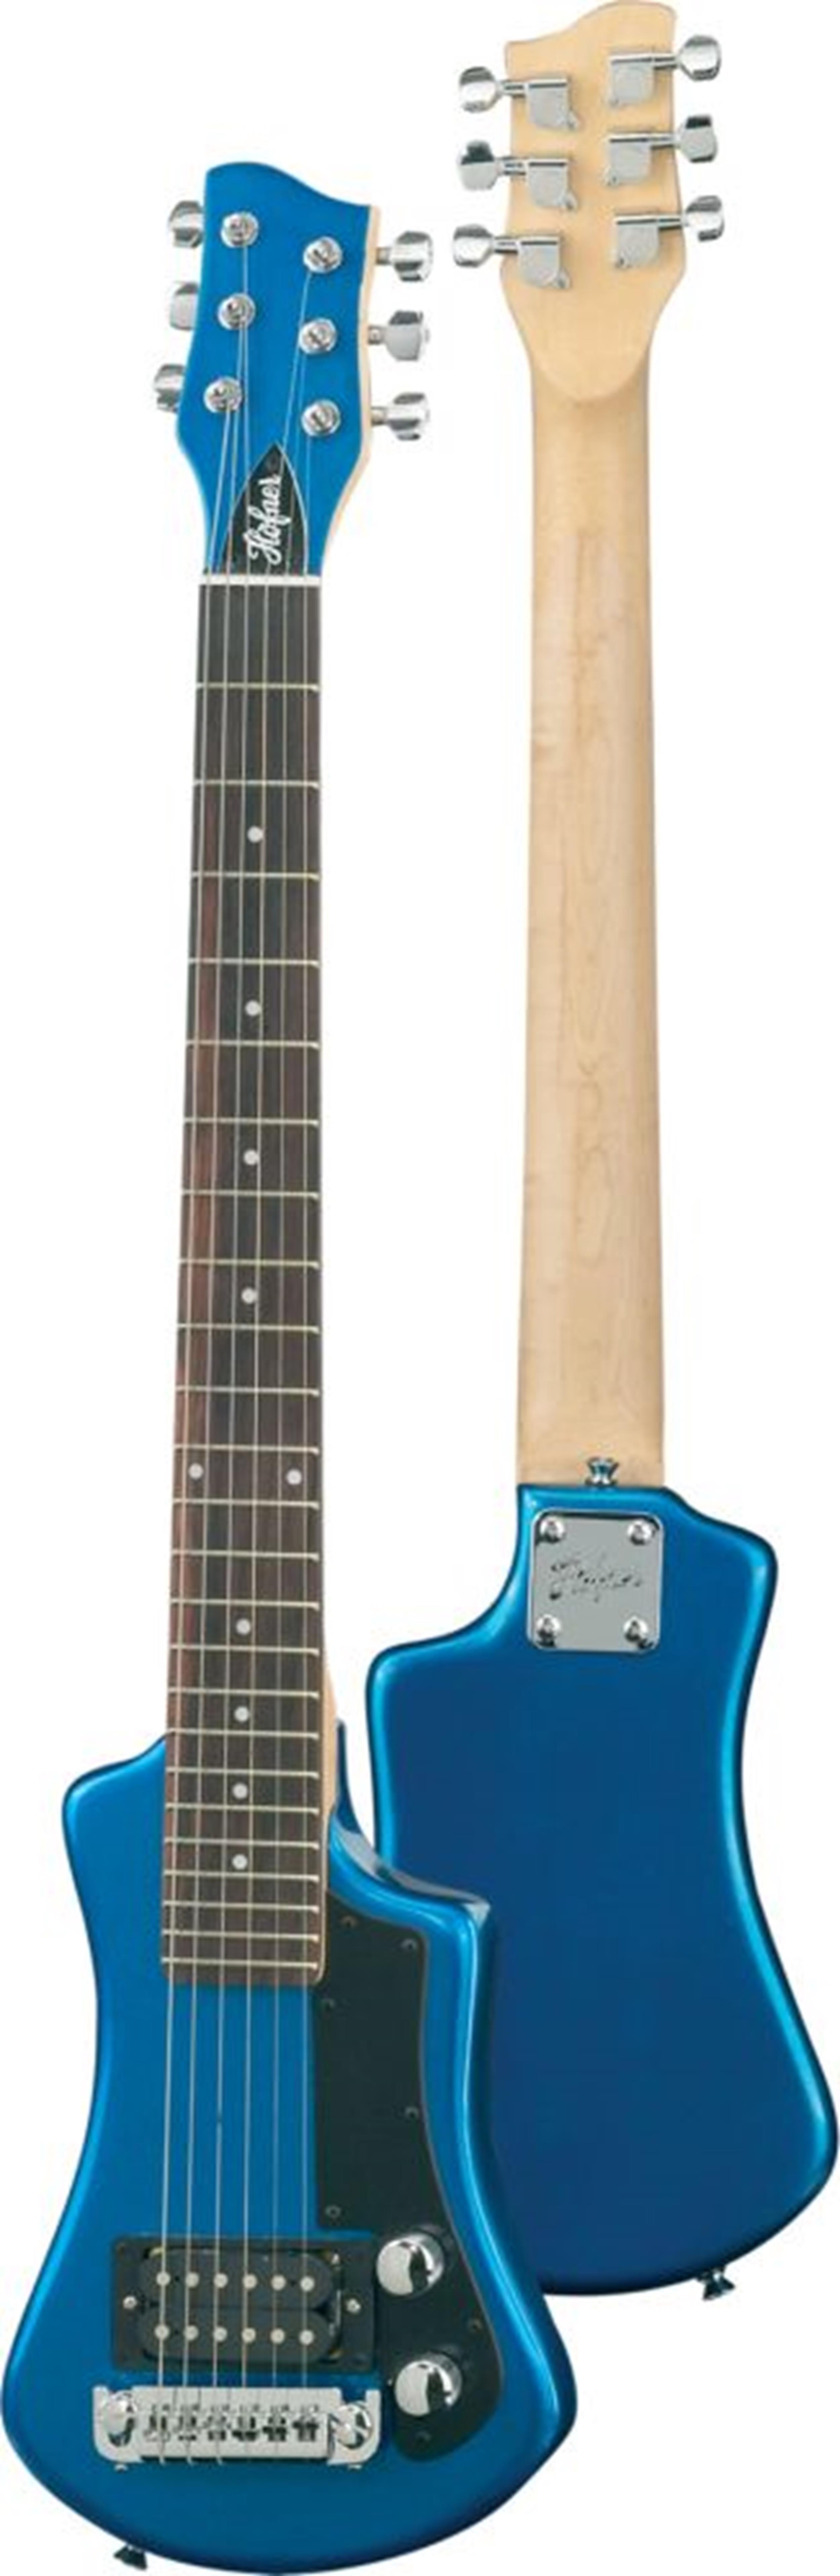 HOFNER-HCT-SH-BLUE-SHORTY-MINI-ELECTRIC-GUITAR-BLUE-sku-7800